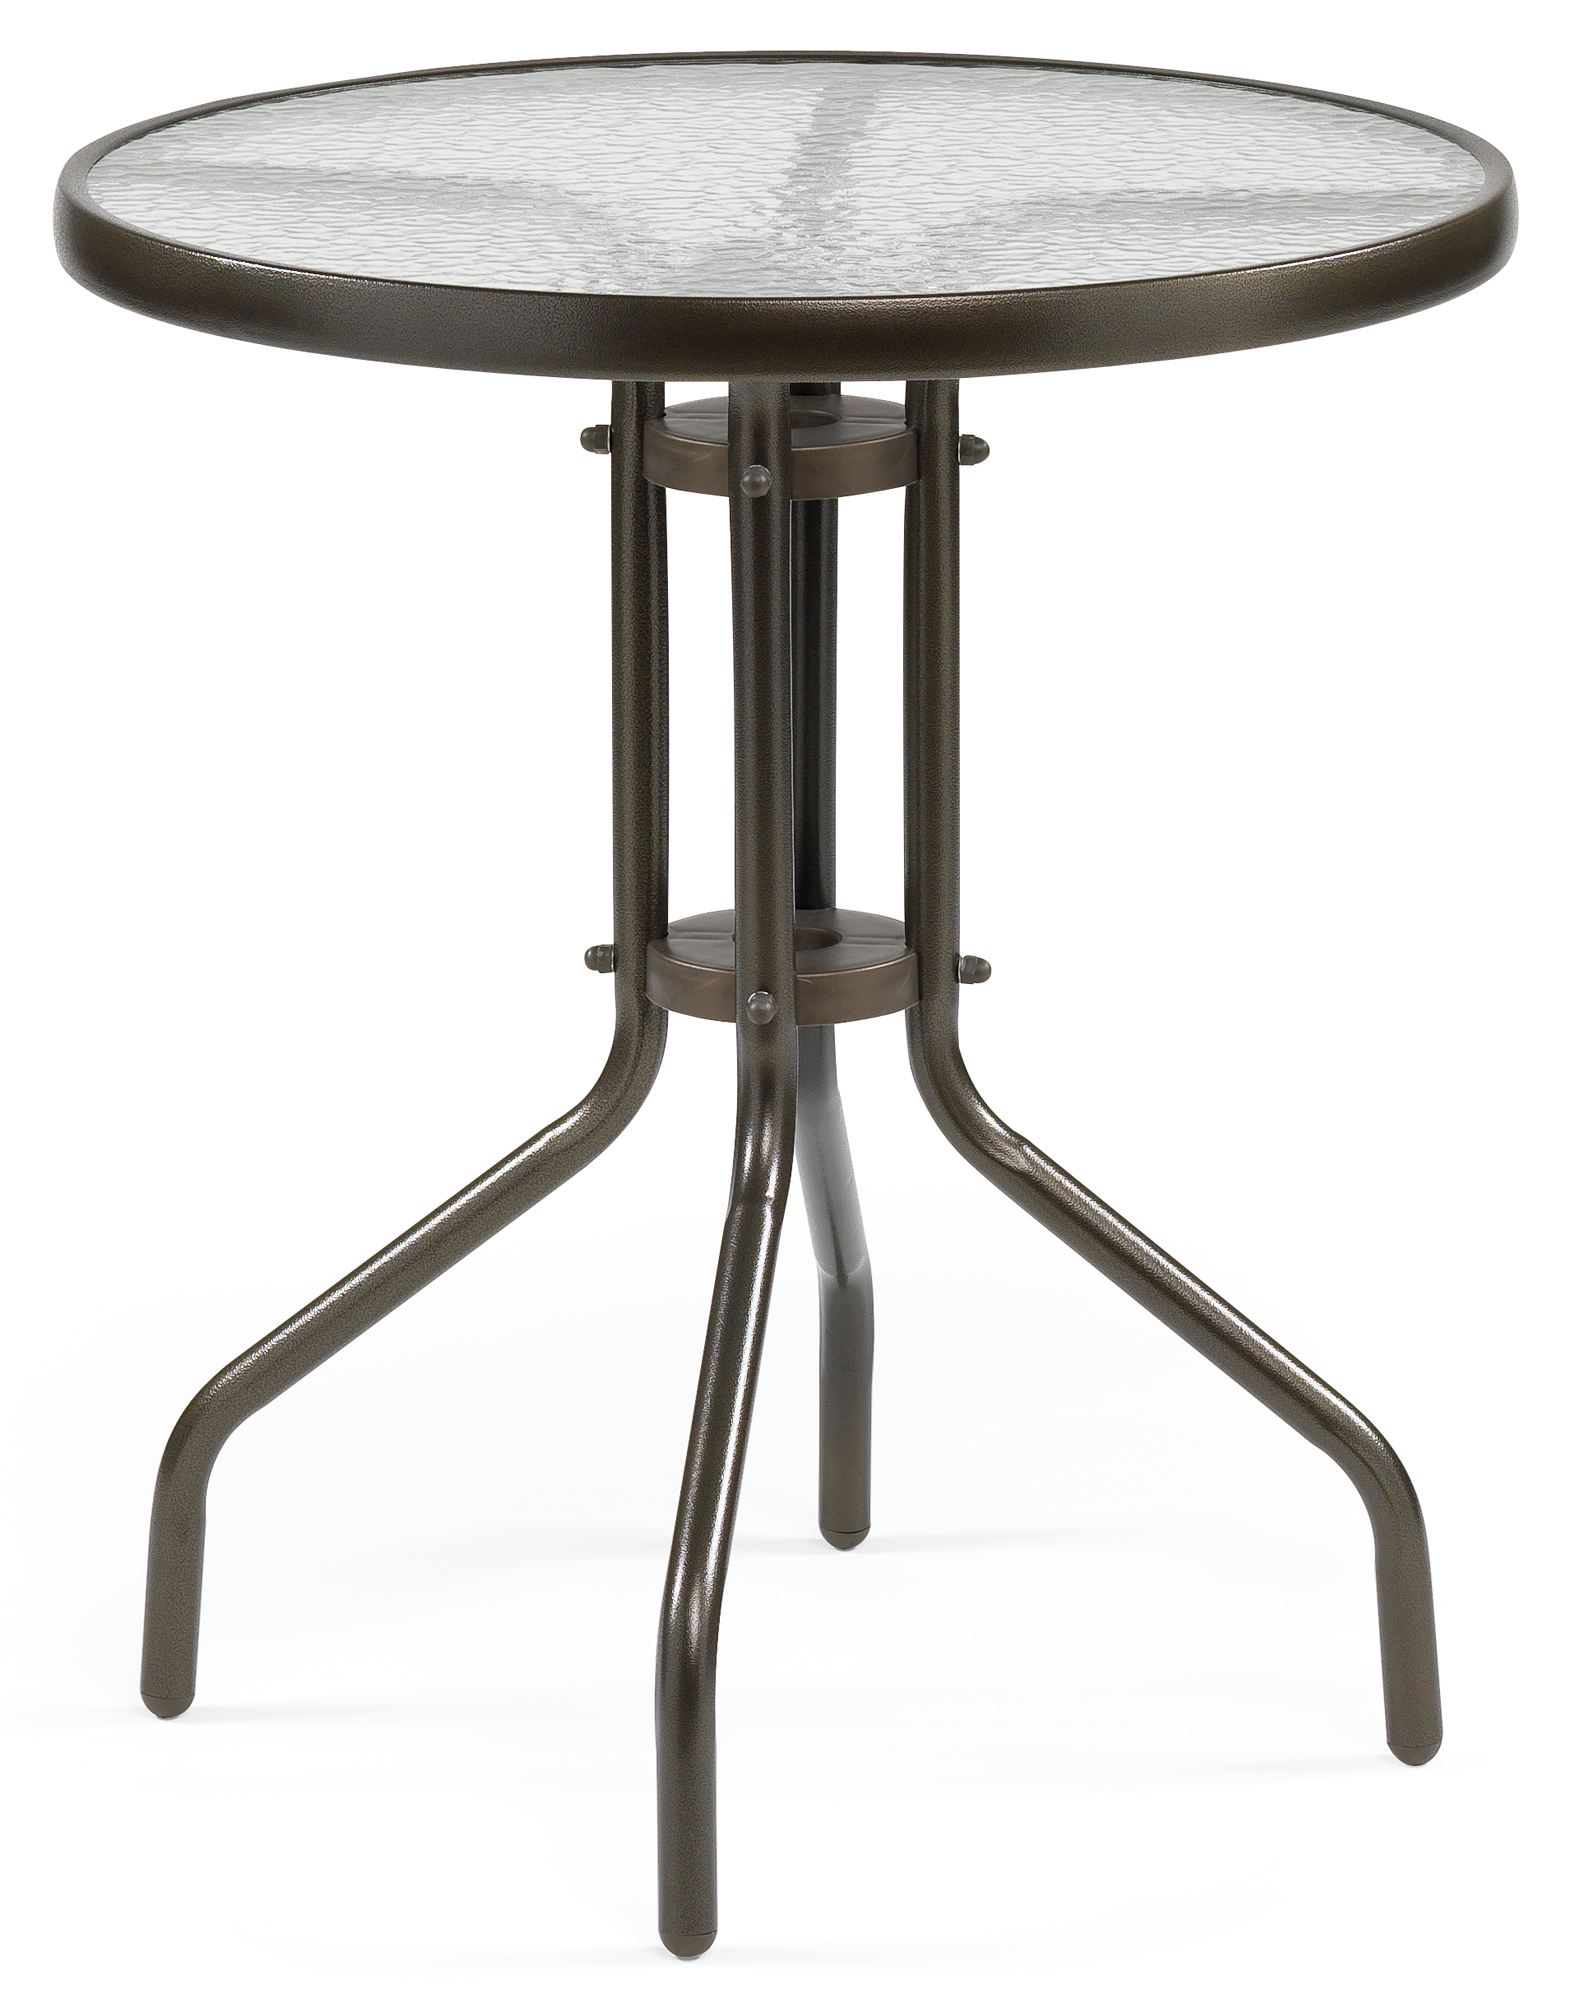 Alvdalen bord rund 60 svart 299 kr Trendrum se